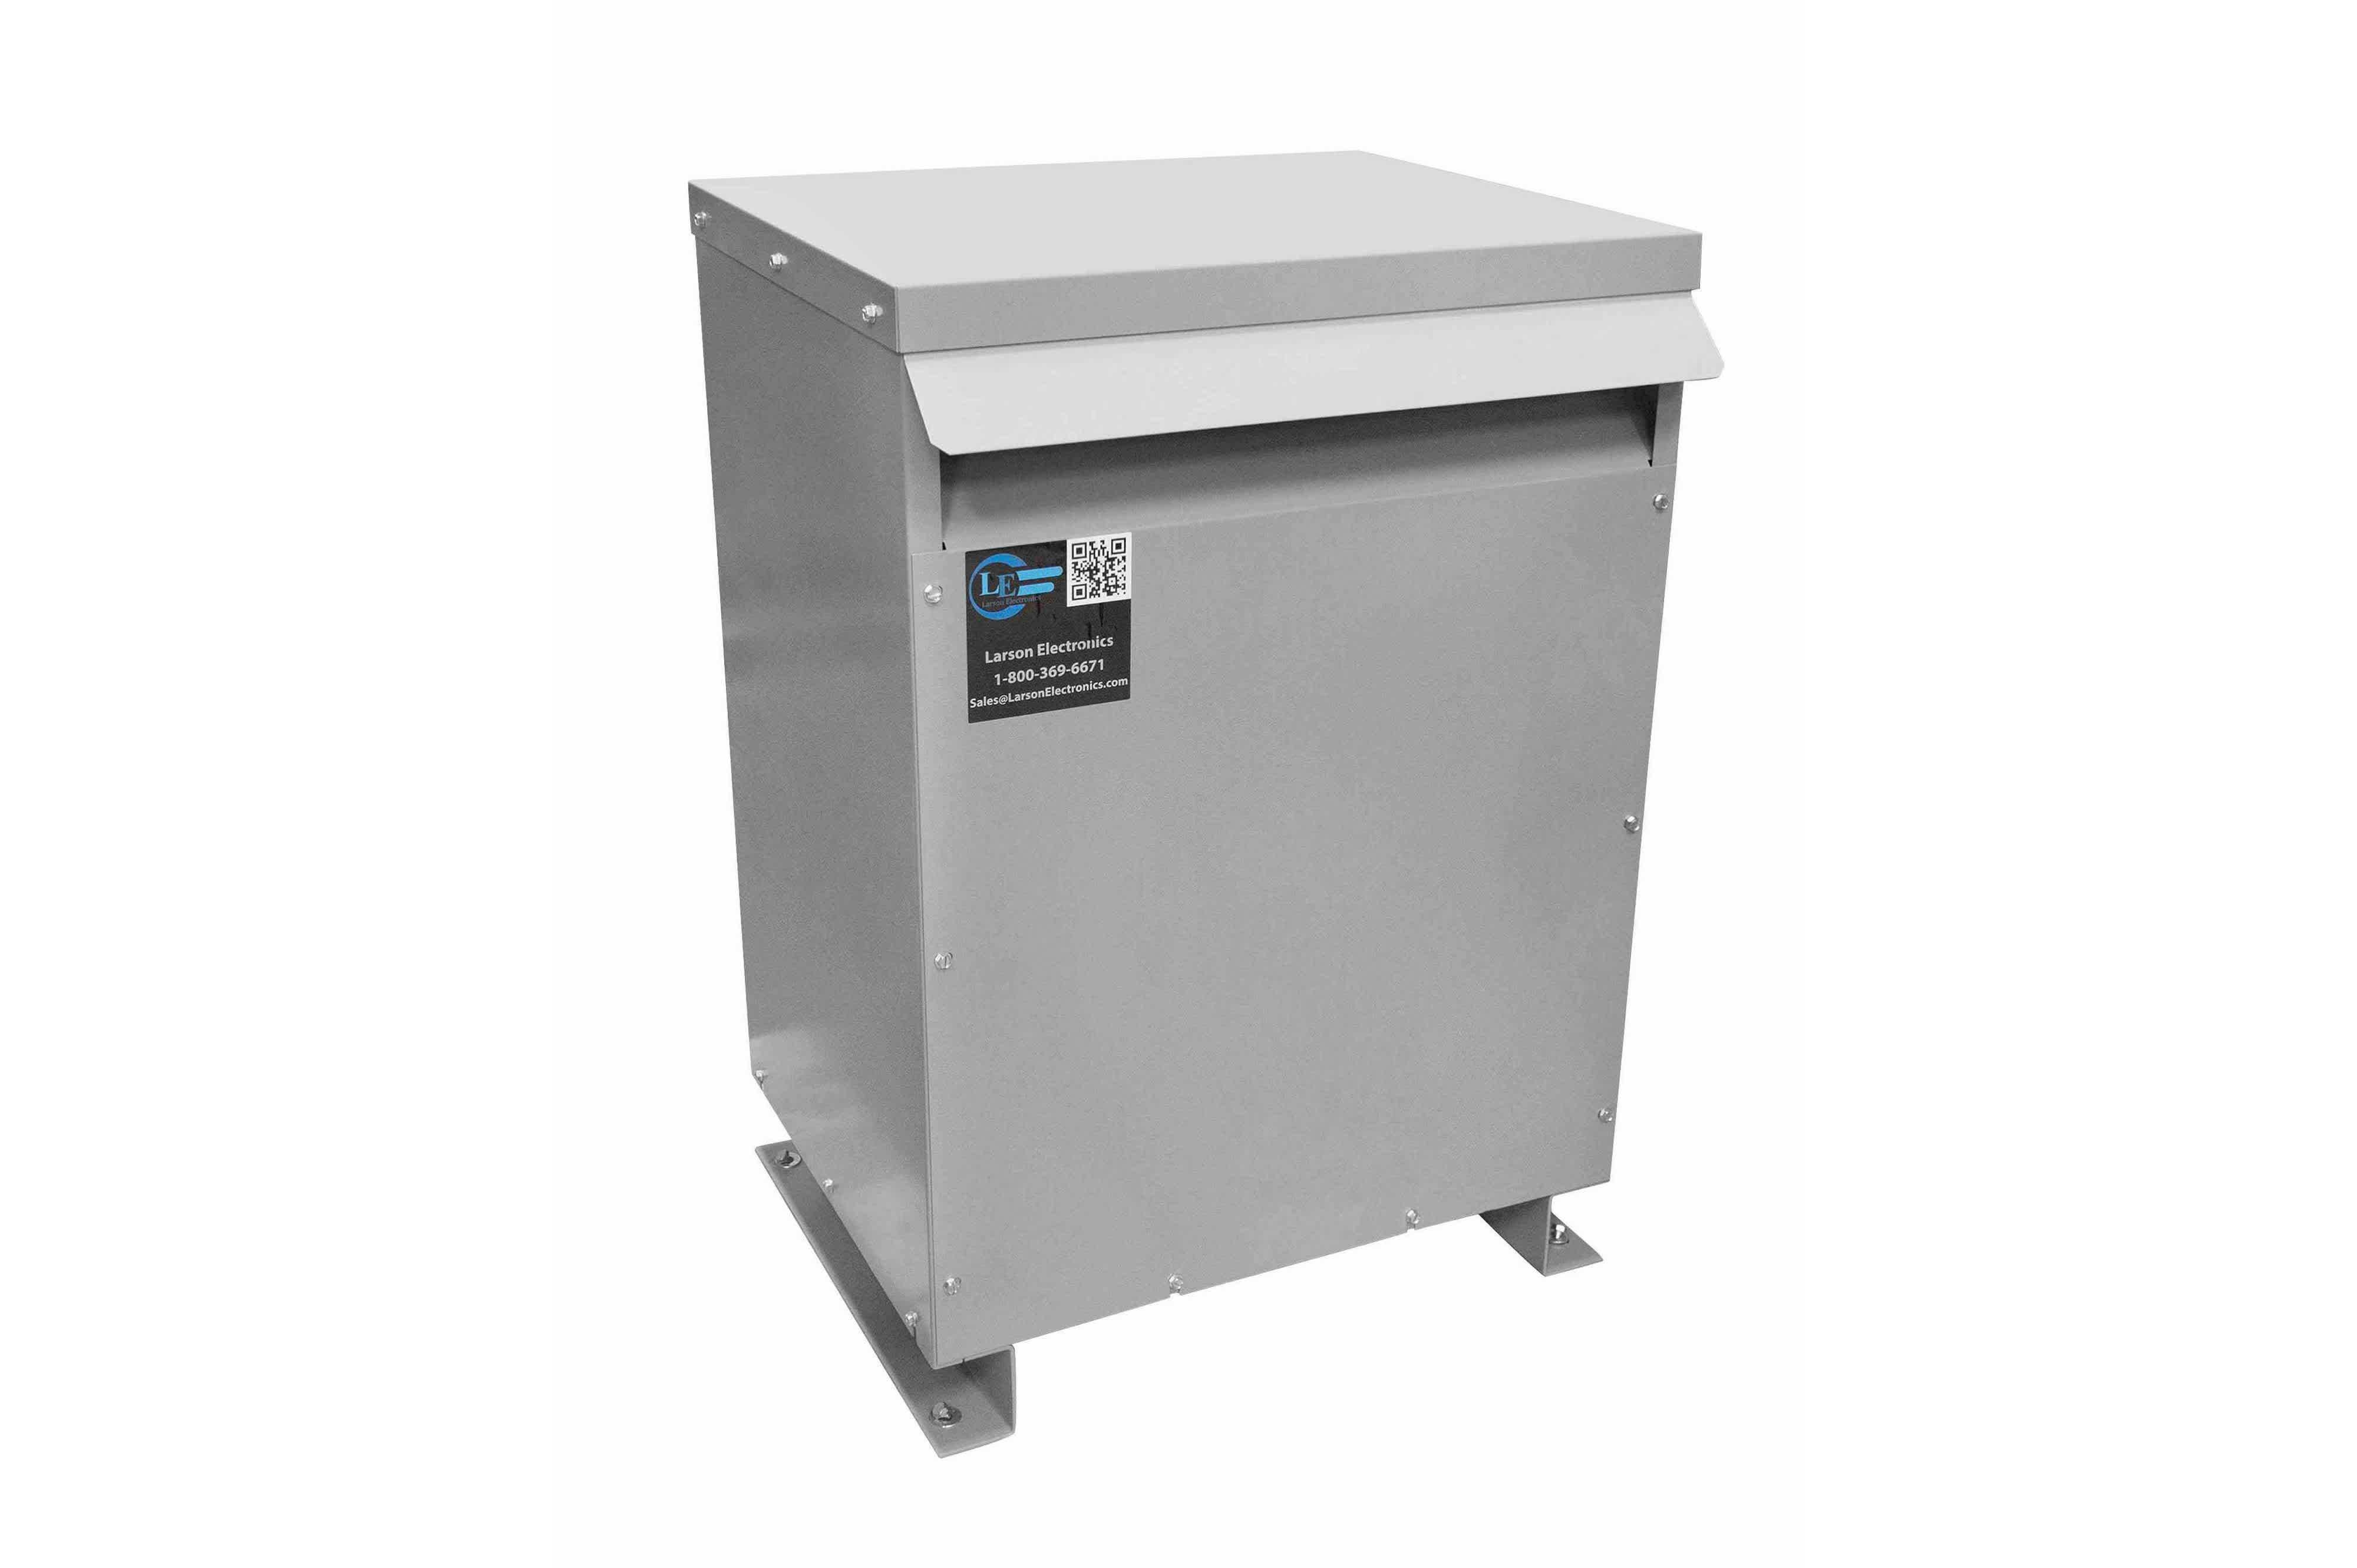 20 kVA 3PH DOE Transformer, 380V Delta Primary, 208Y/120 Wye-N Secondary, N3R, Ventilated, 60 Hz